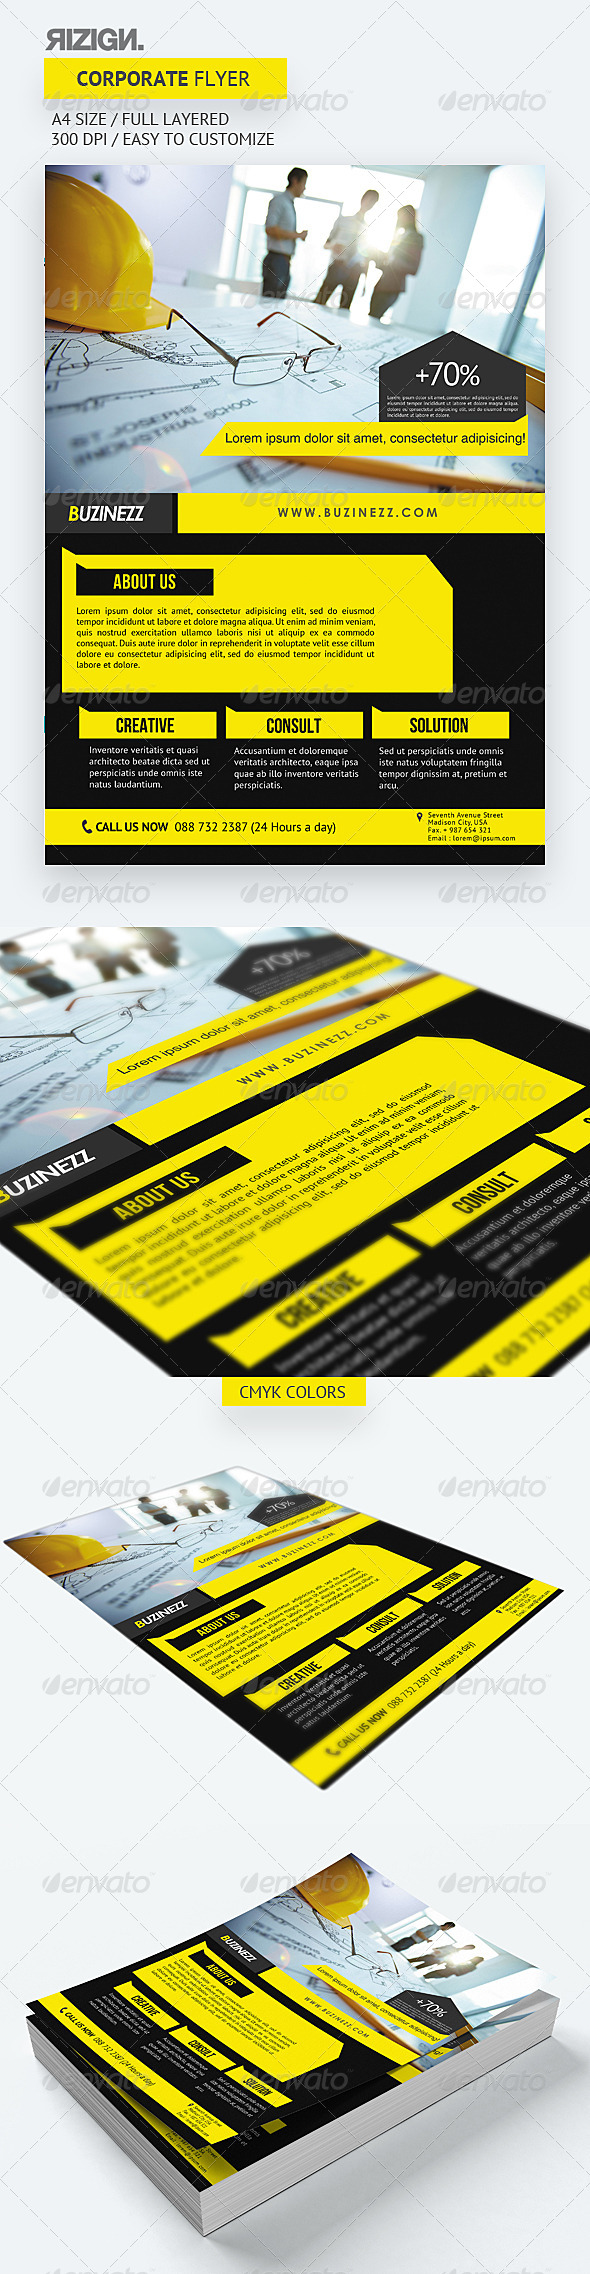 GraphicRiver Corporate Flyer 5625615